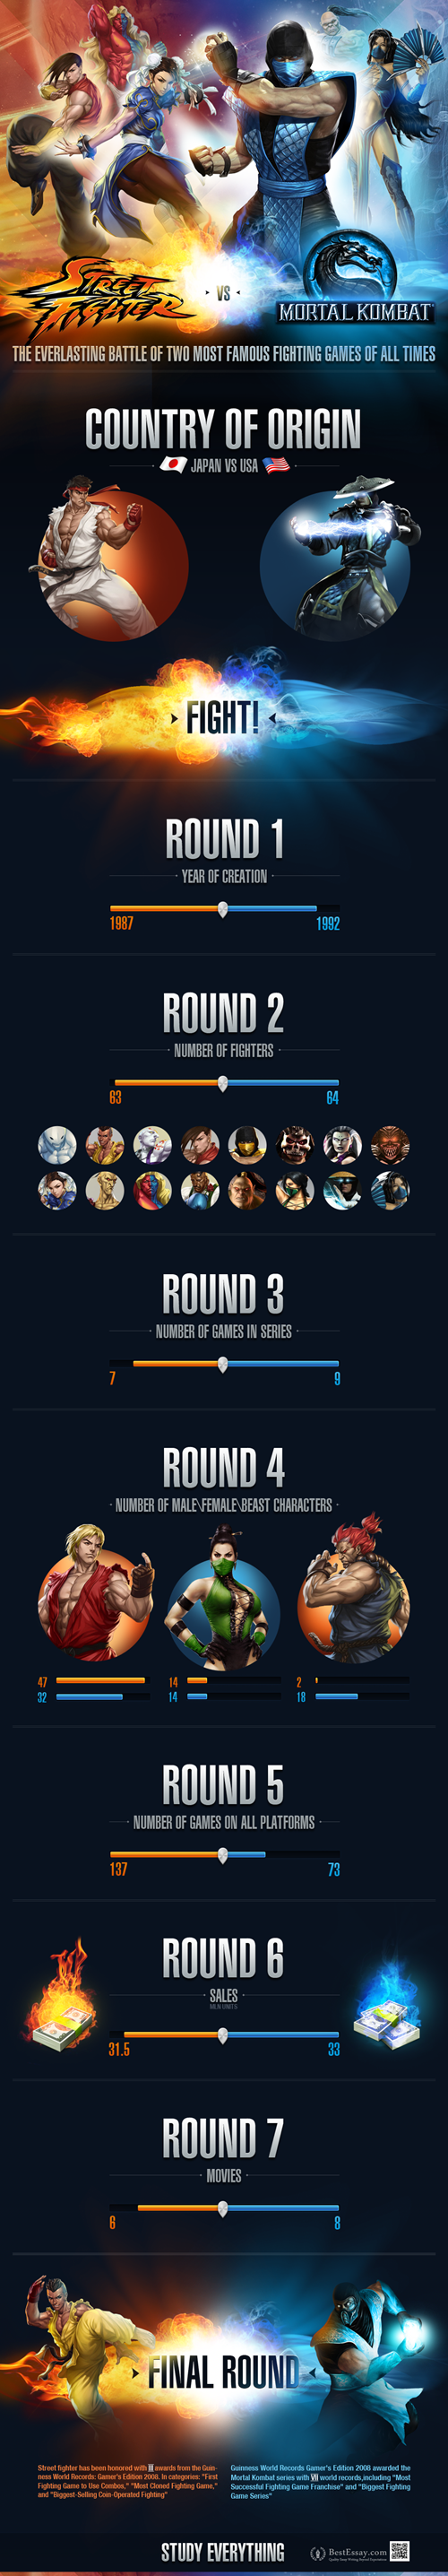 Mortal Kombat Street fighter video games - 6562818560